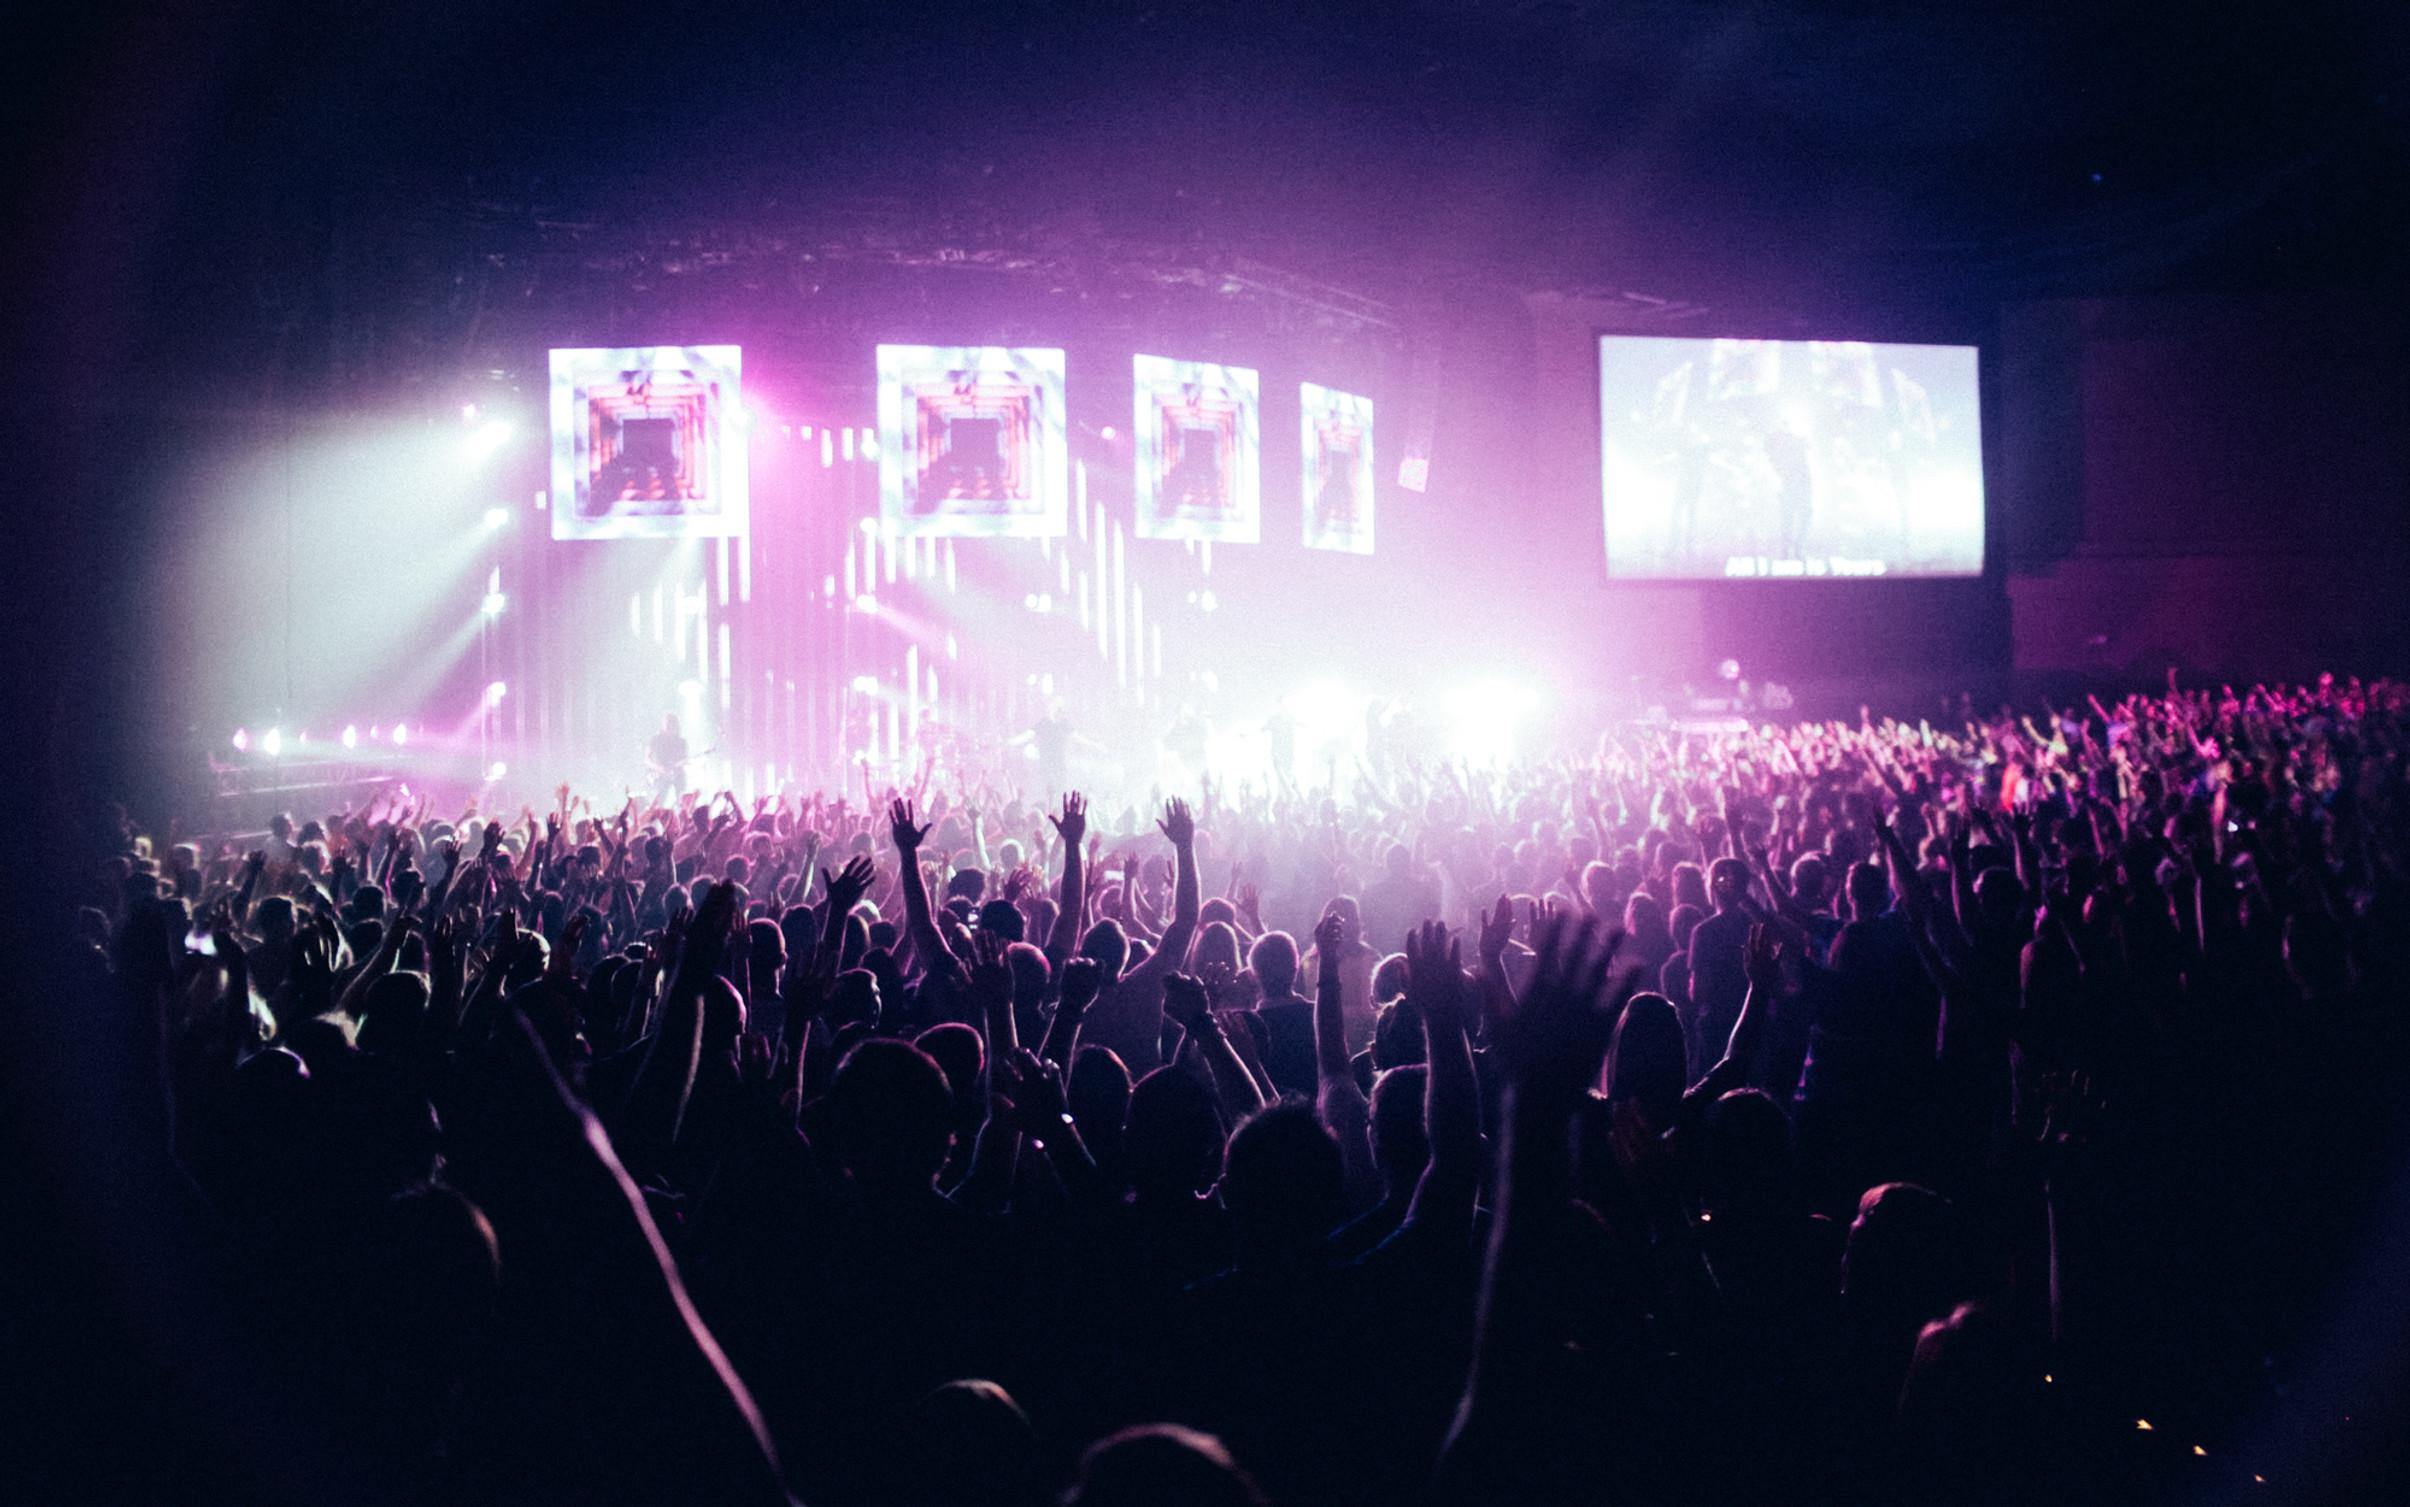 Nightclub / Concert Performance